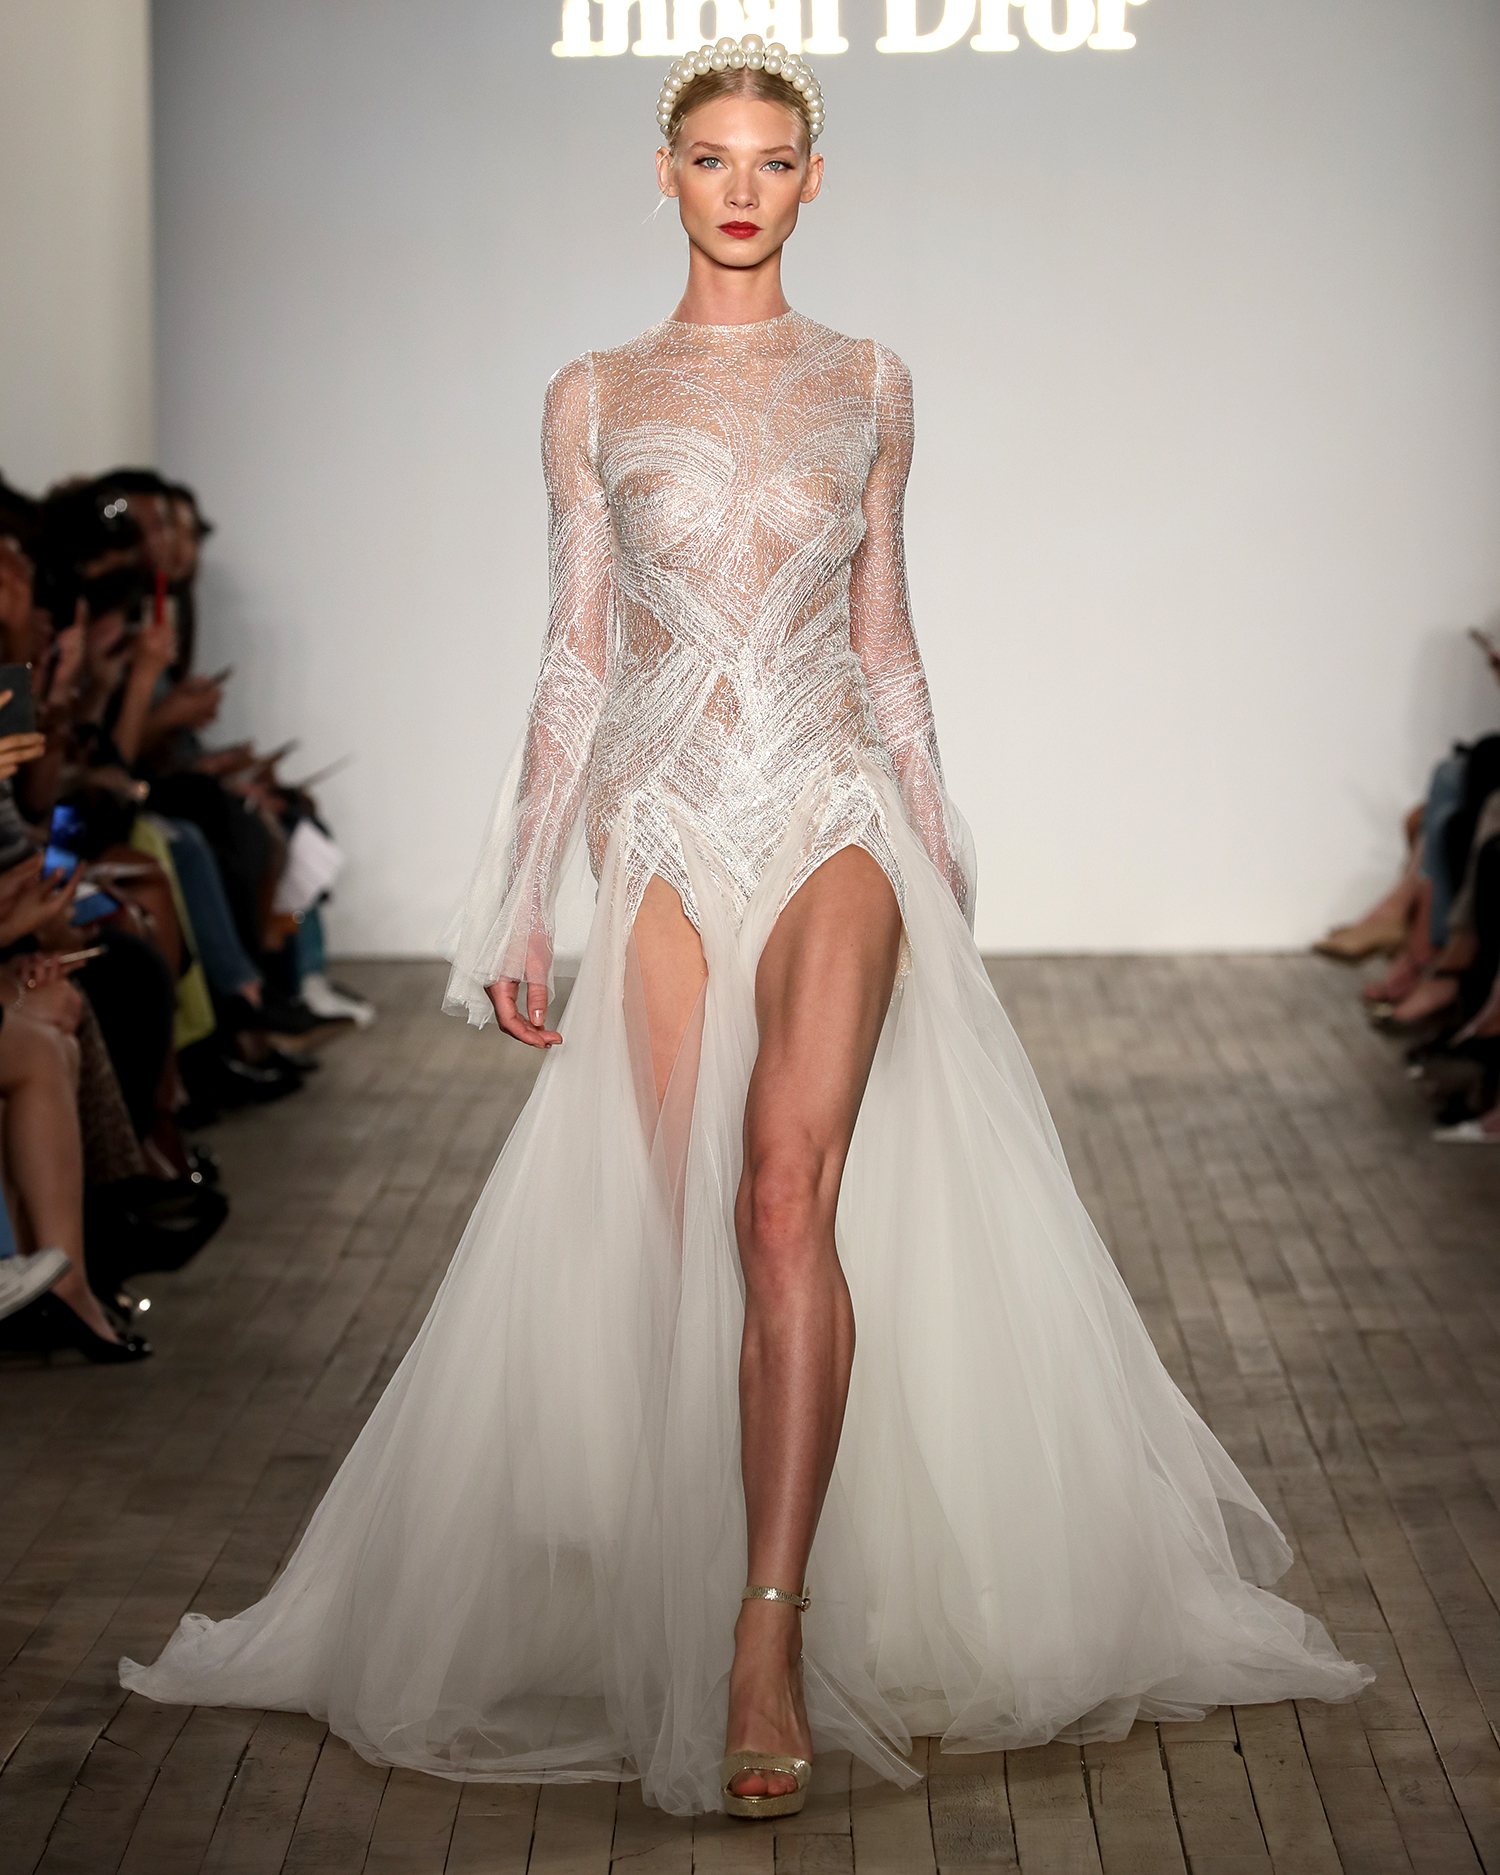 inbal dror wedding dress high-neck with tulle skirt overlay